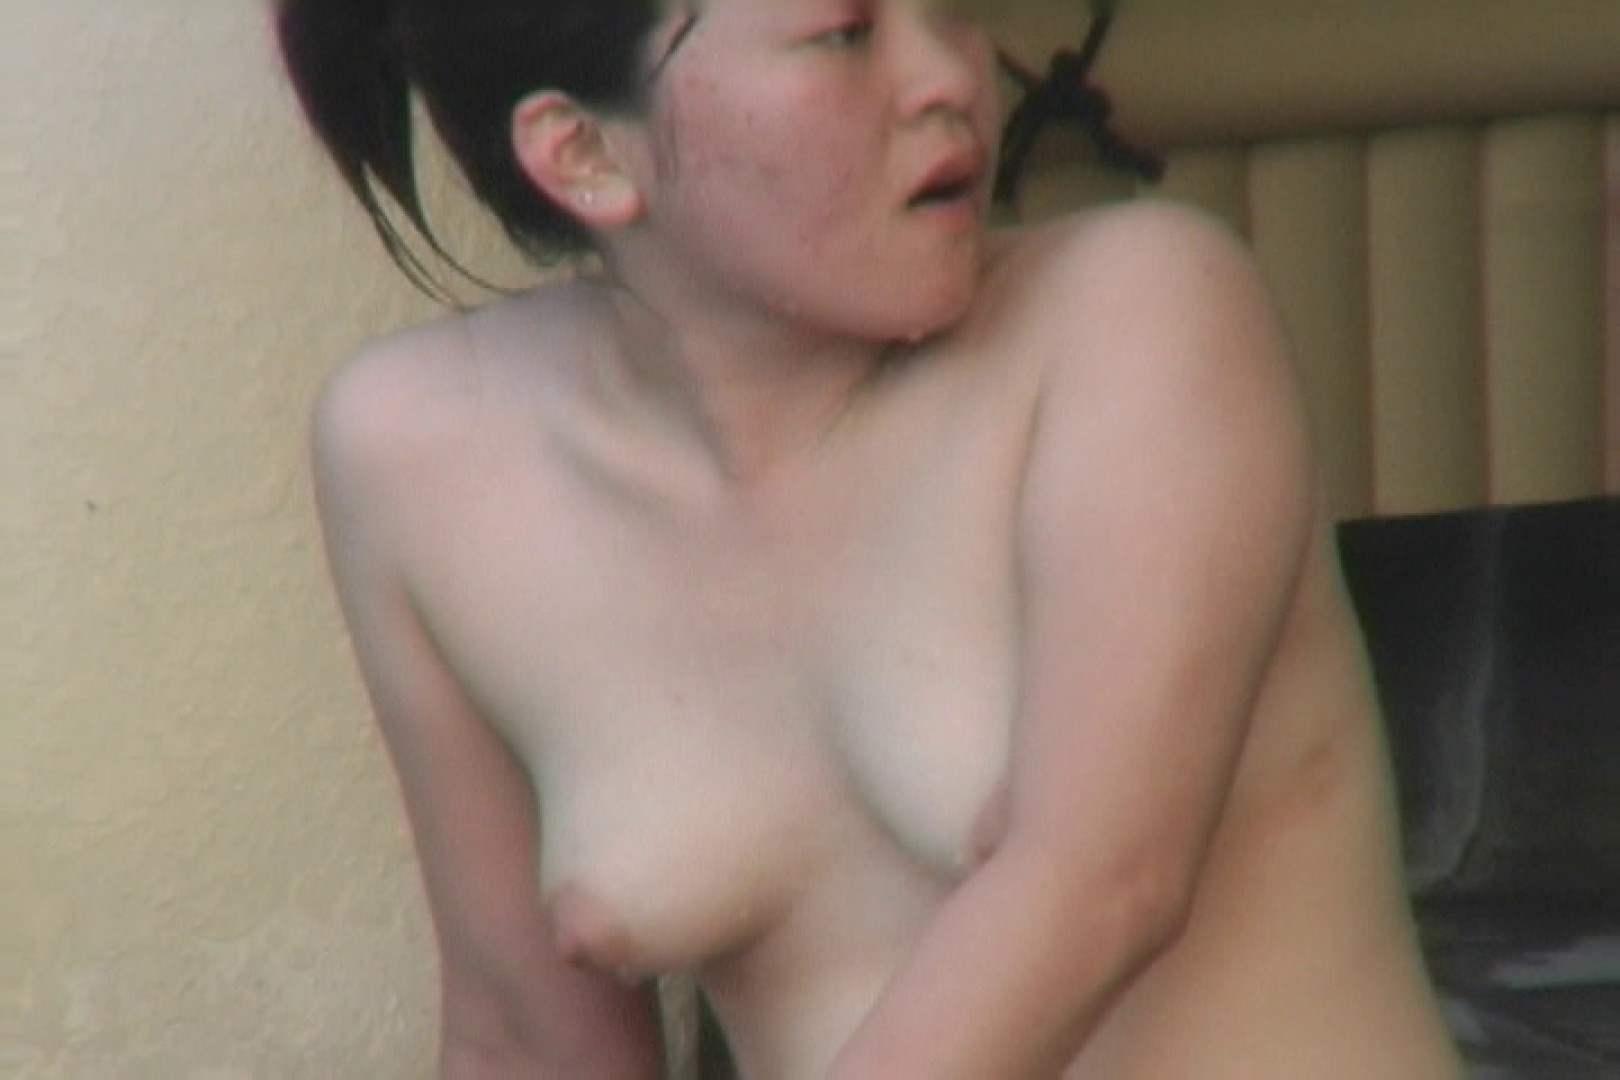 Aquaな露天風呂Vol.115 盗撮師作品 アダルト動画キャプチャ 91pic 38